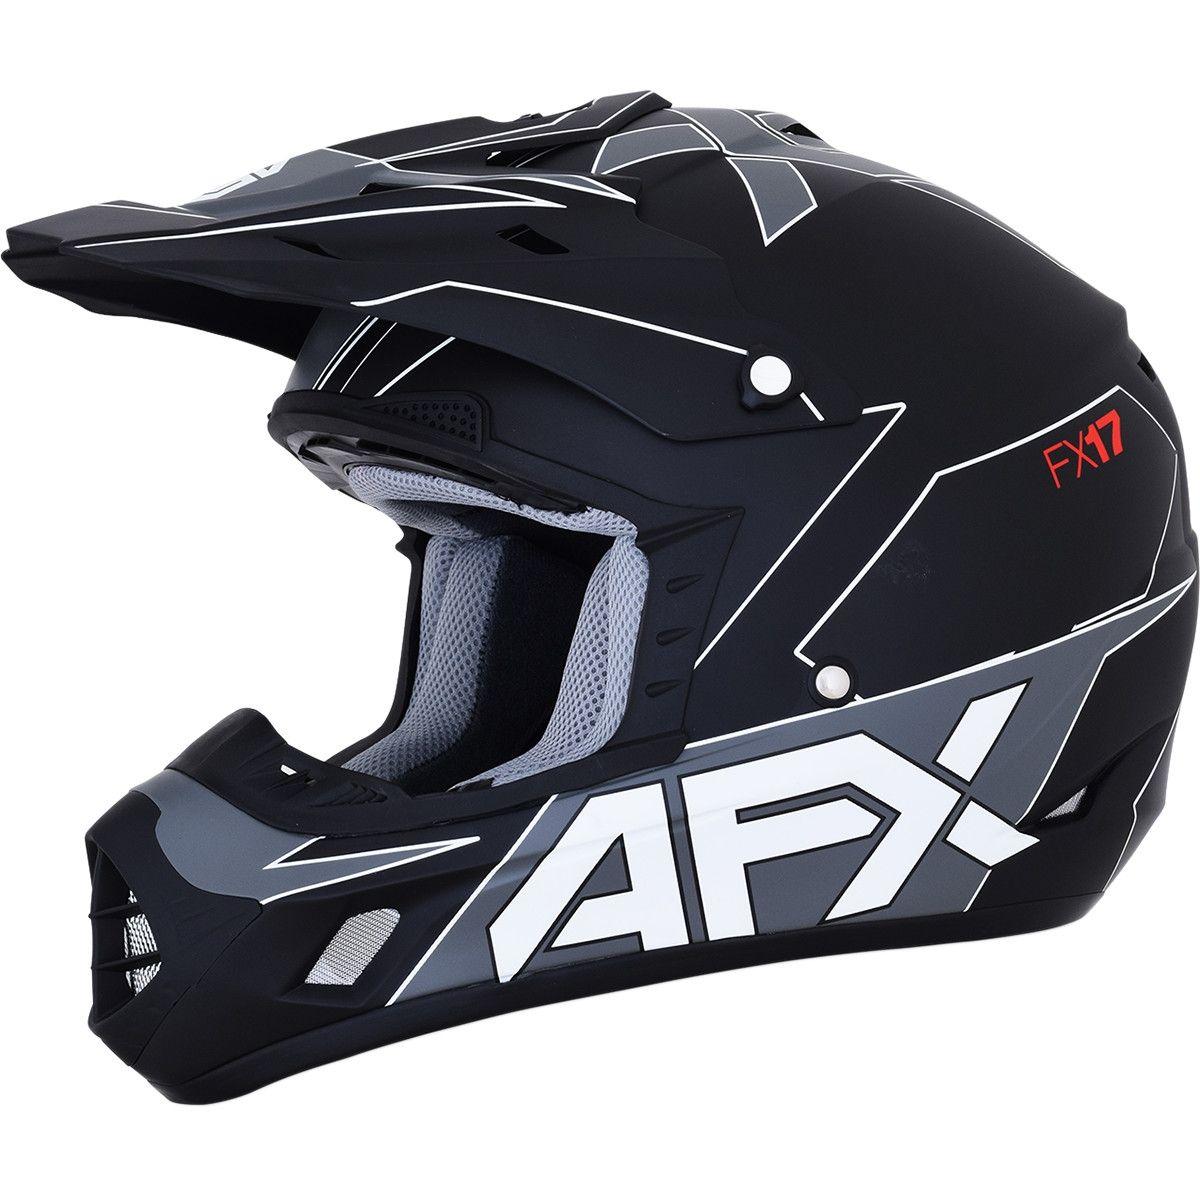 AFX Crosshelm FX-17 Matte Black/White